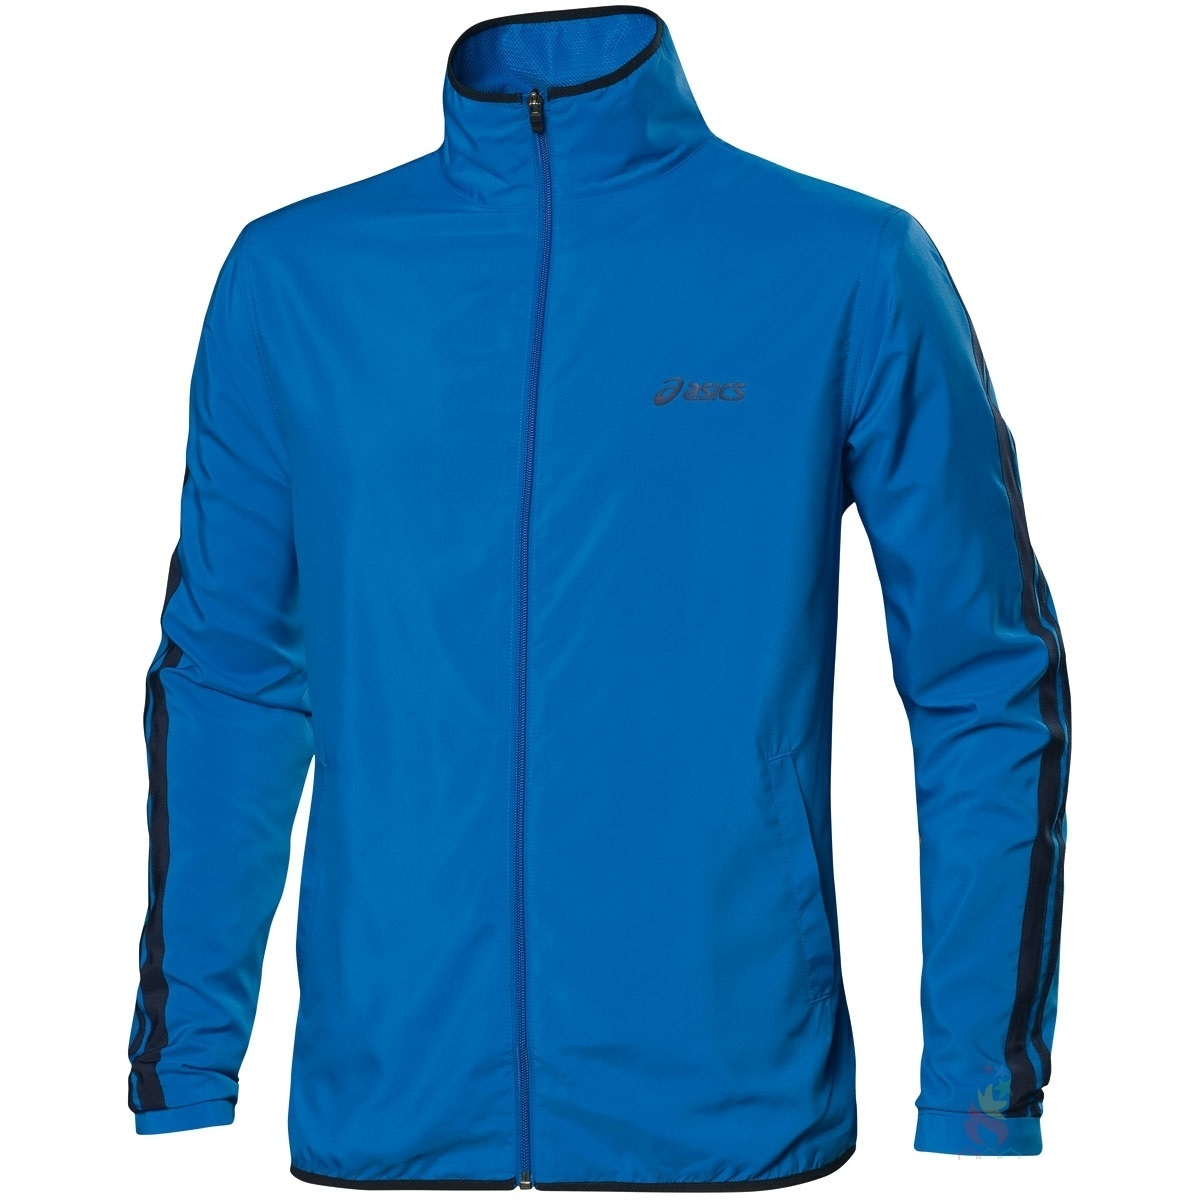 Мужская ветровка Asics Woven Track Jacket (113154 0861) голубая фото